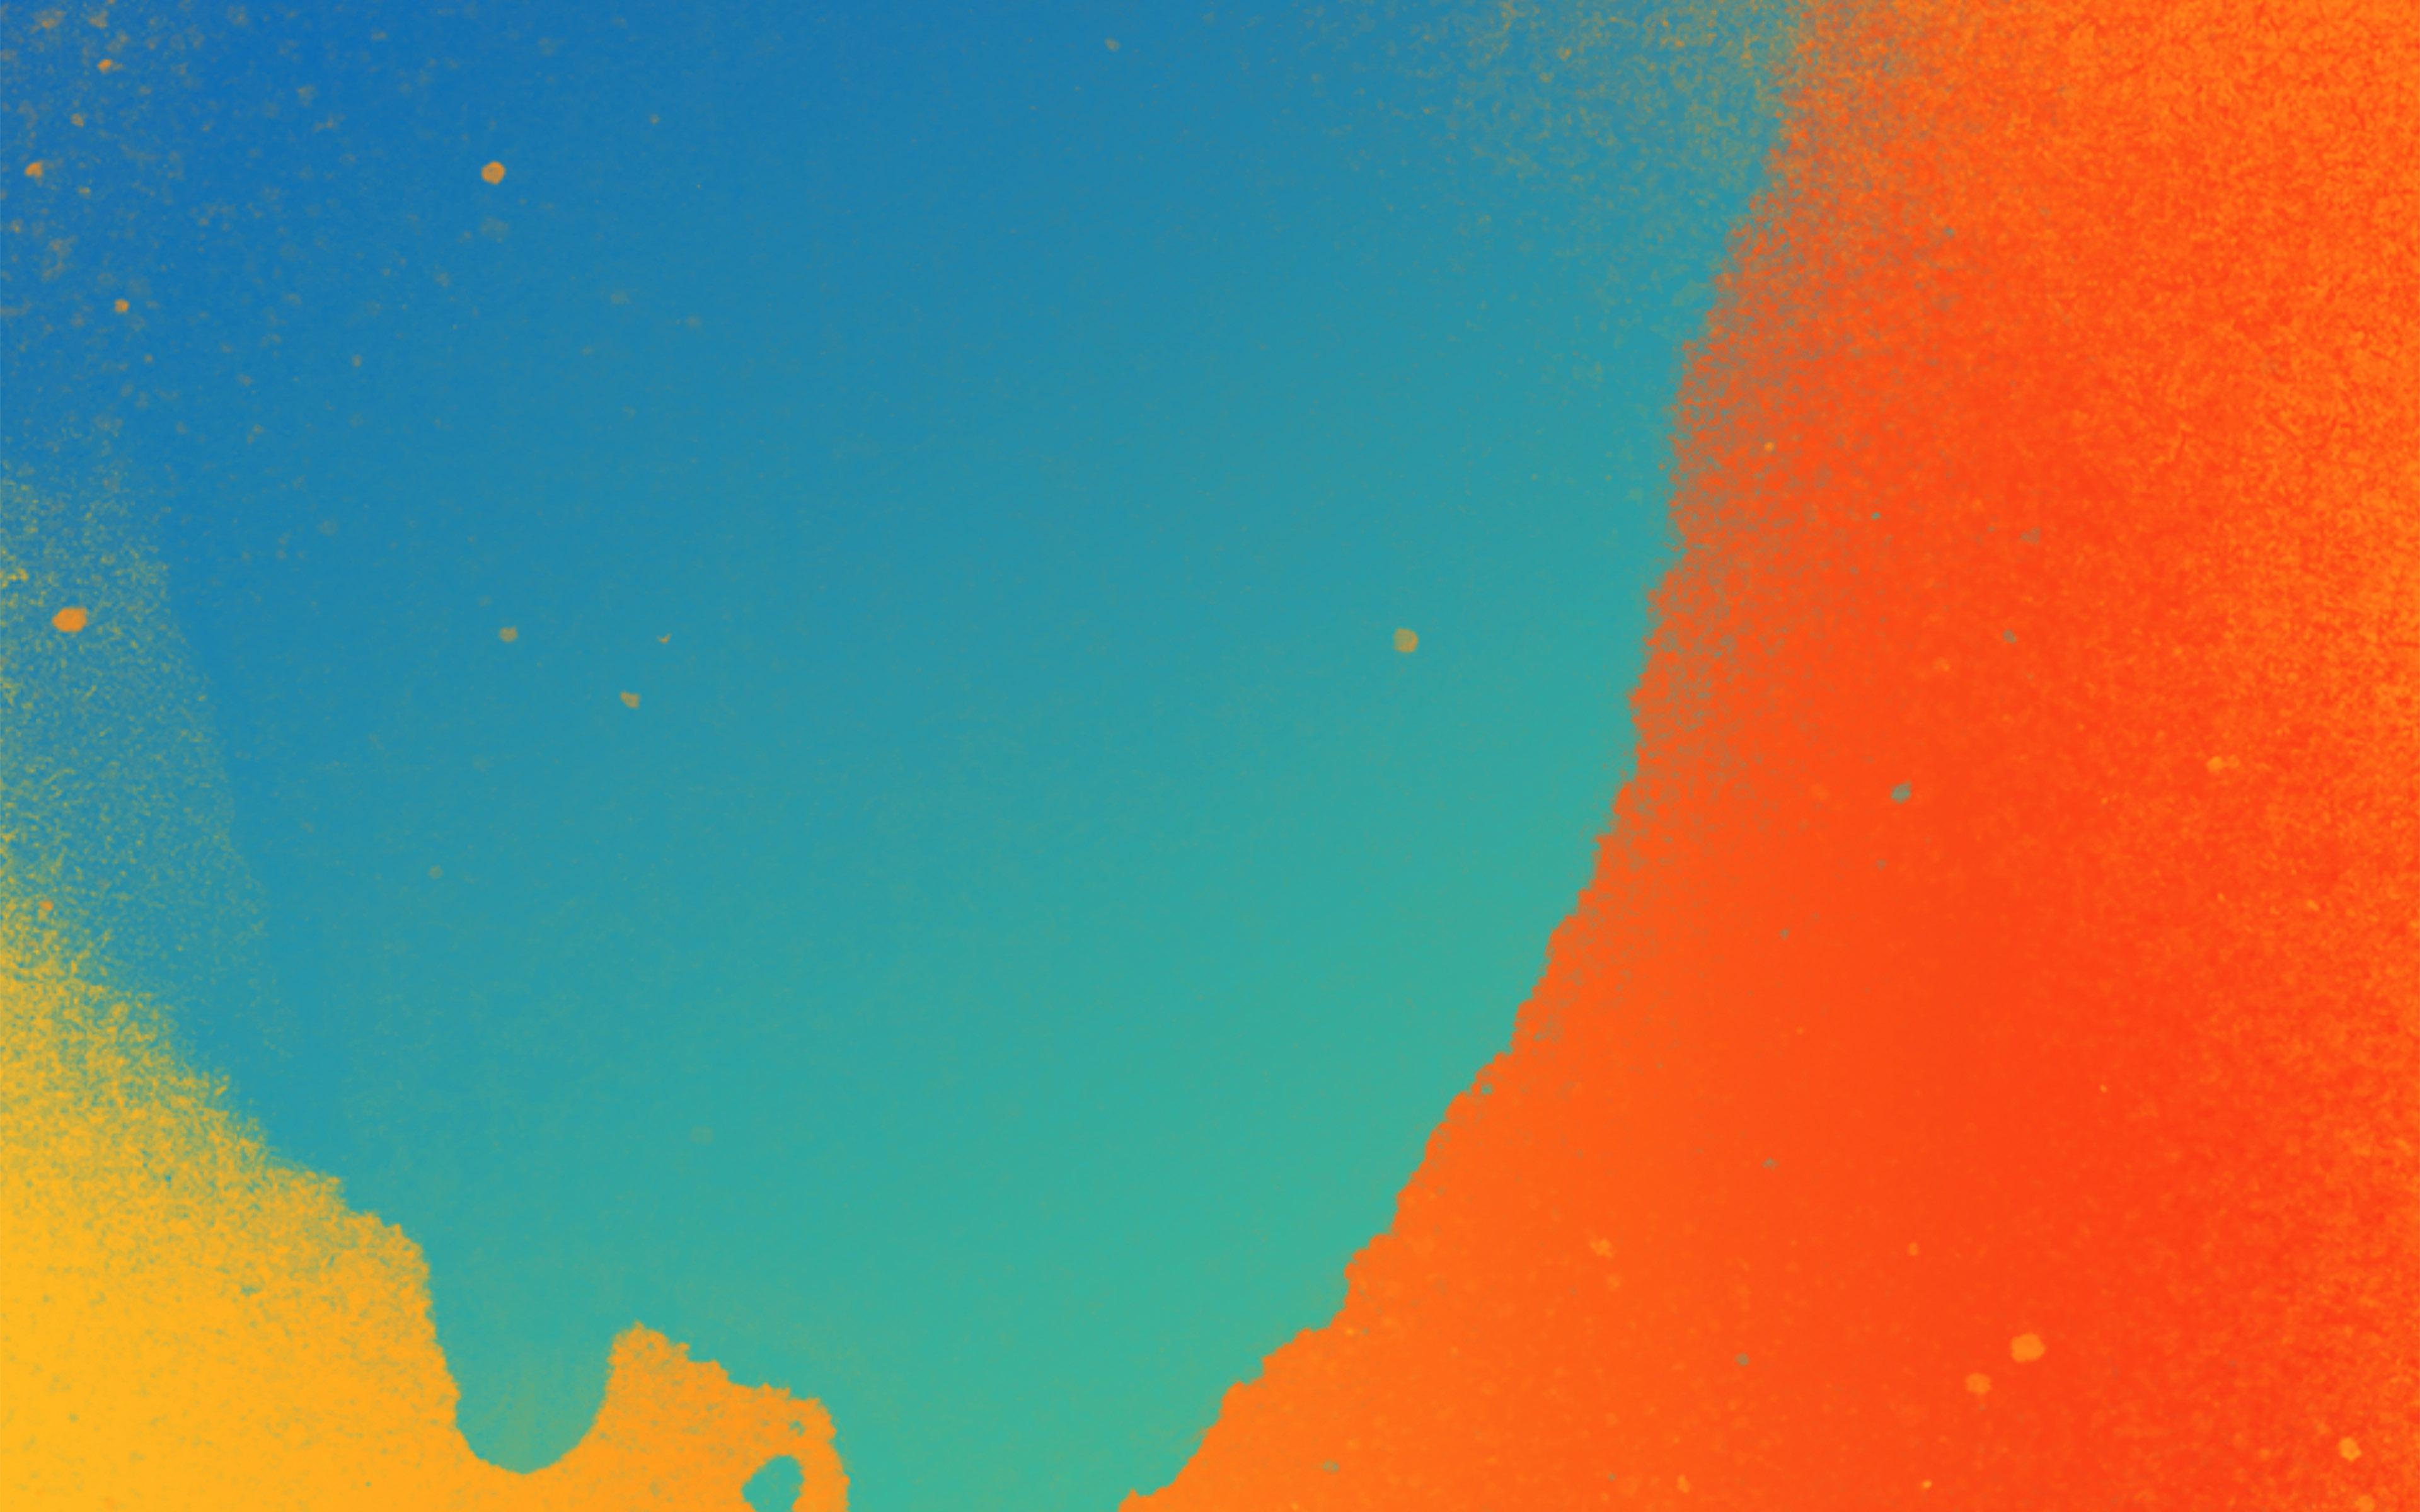 ab09-wallpaper-paint-splatter-illust-art-by-suapp-wallpaper